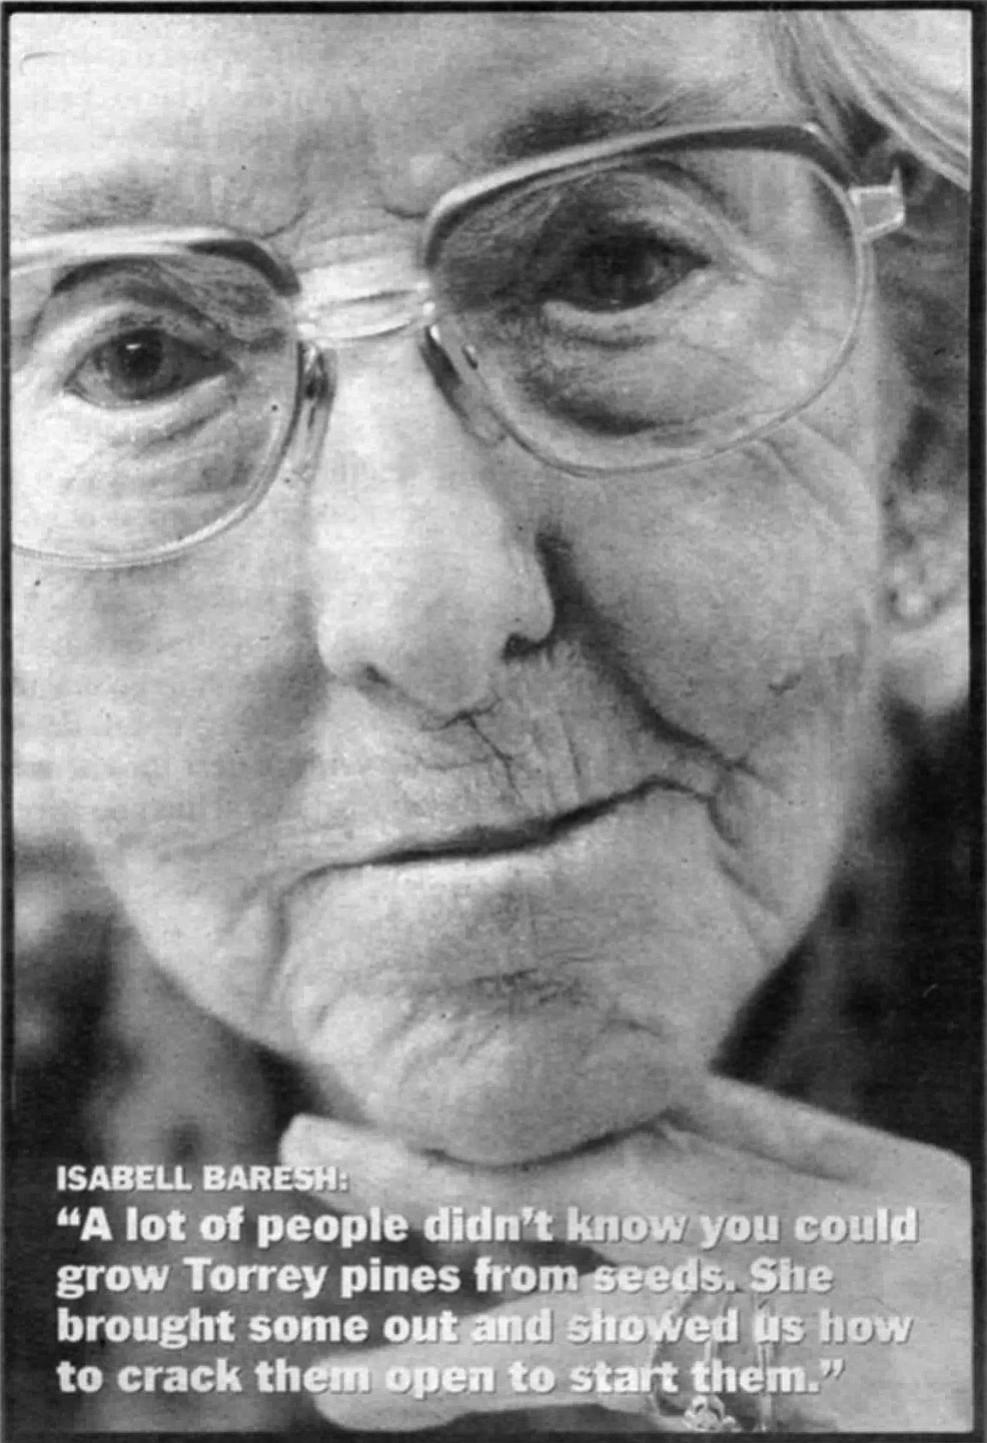 Isabell Baresh